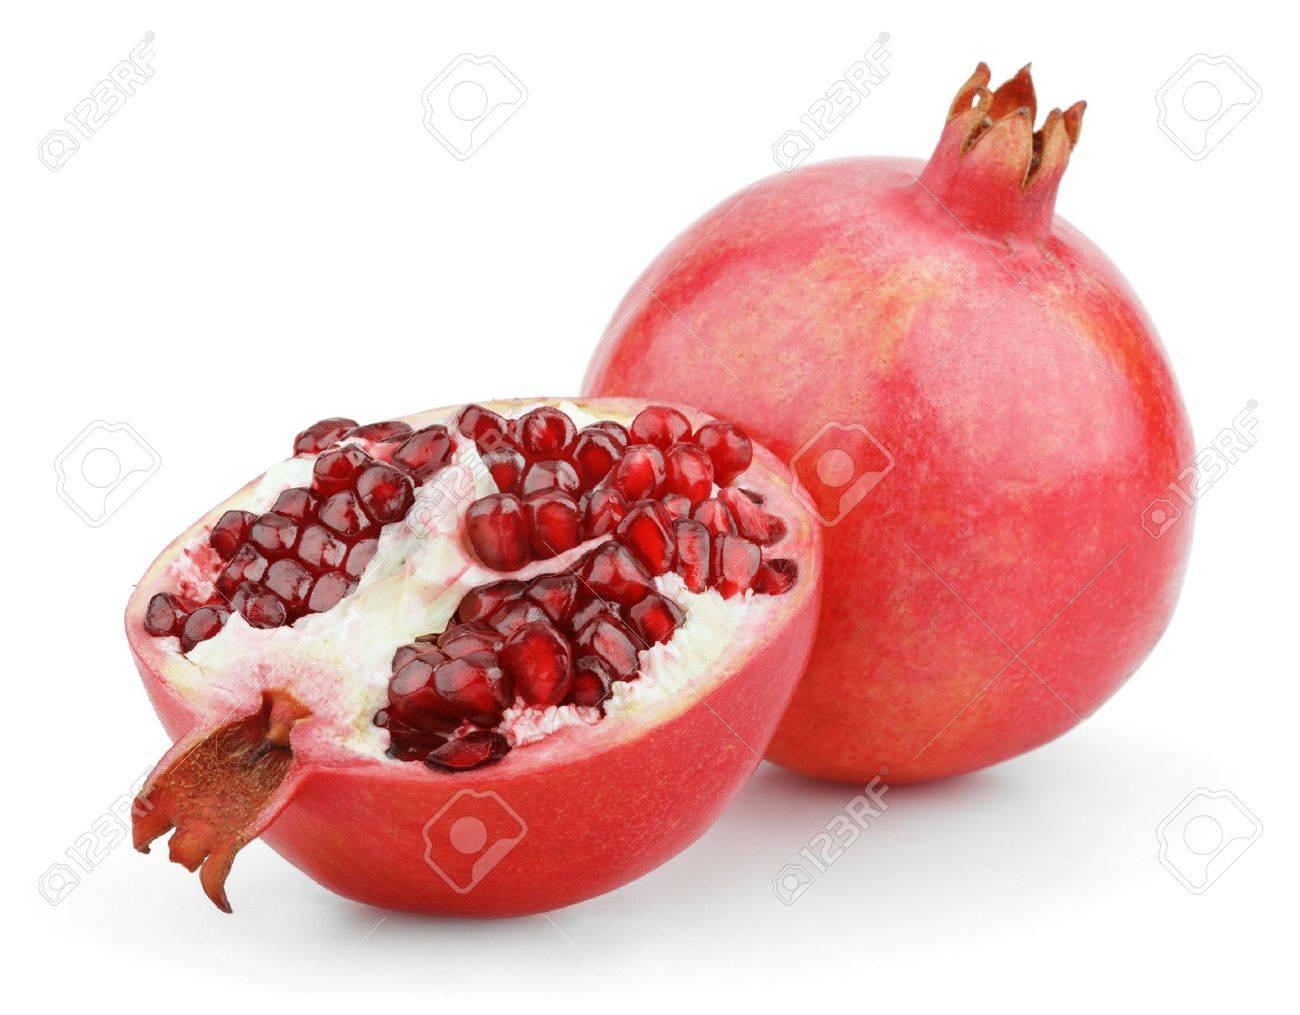 Ripe pomegranate fruit with half isolated on white background - 15021075